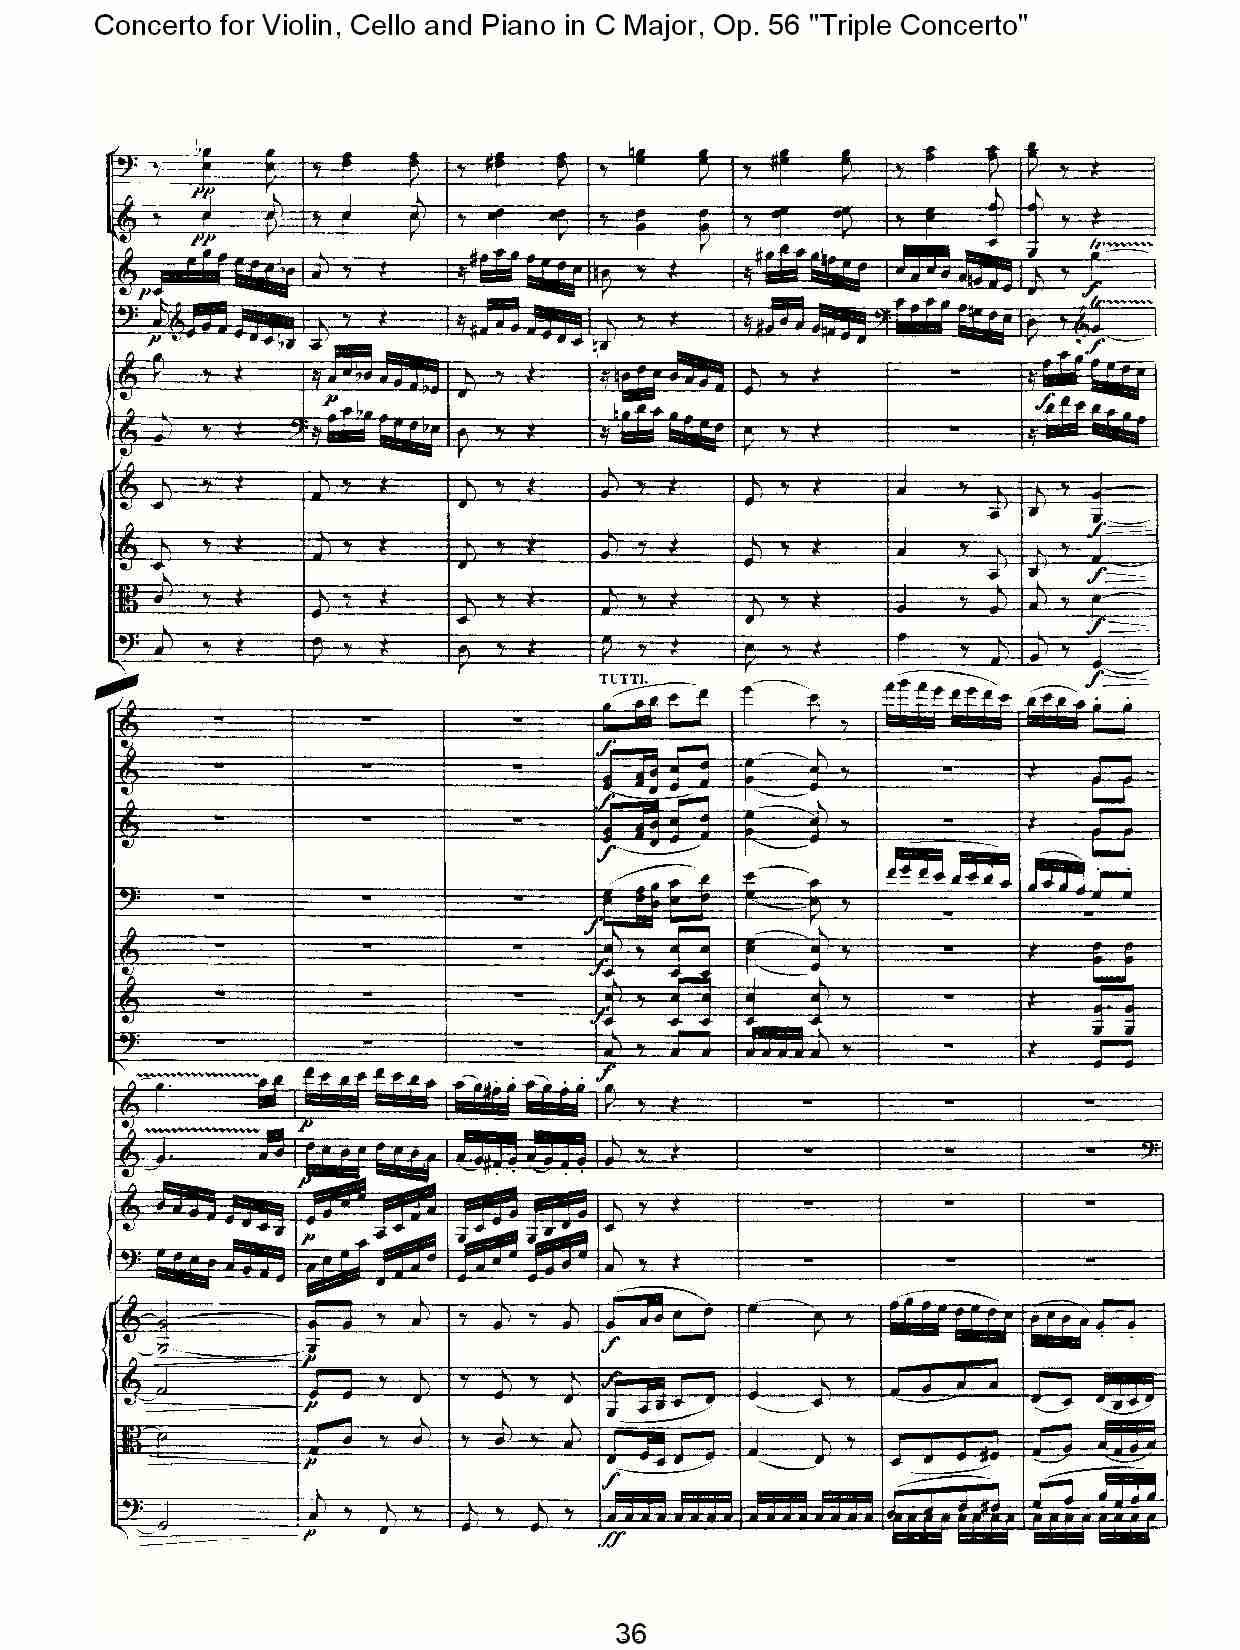 c大调大提琴与钢琴协奏曲 op.56第三乐章(四)